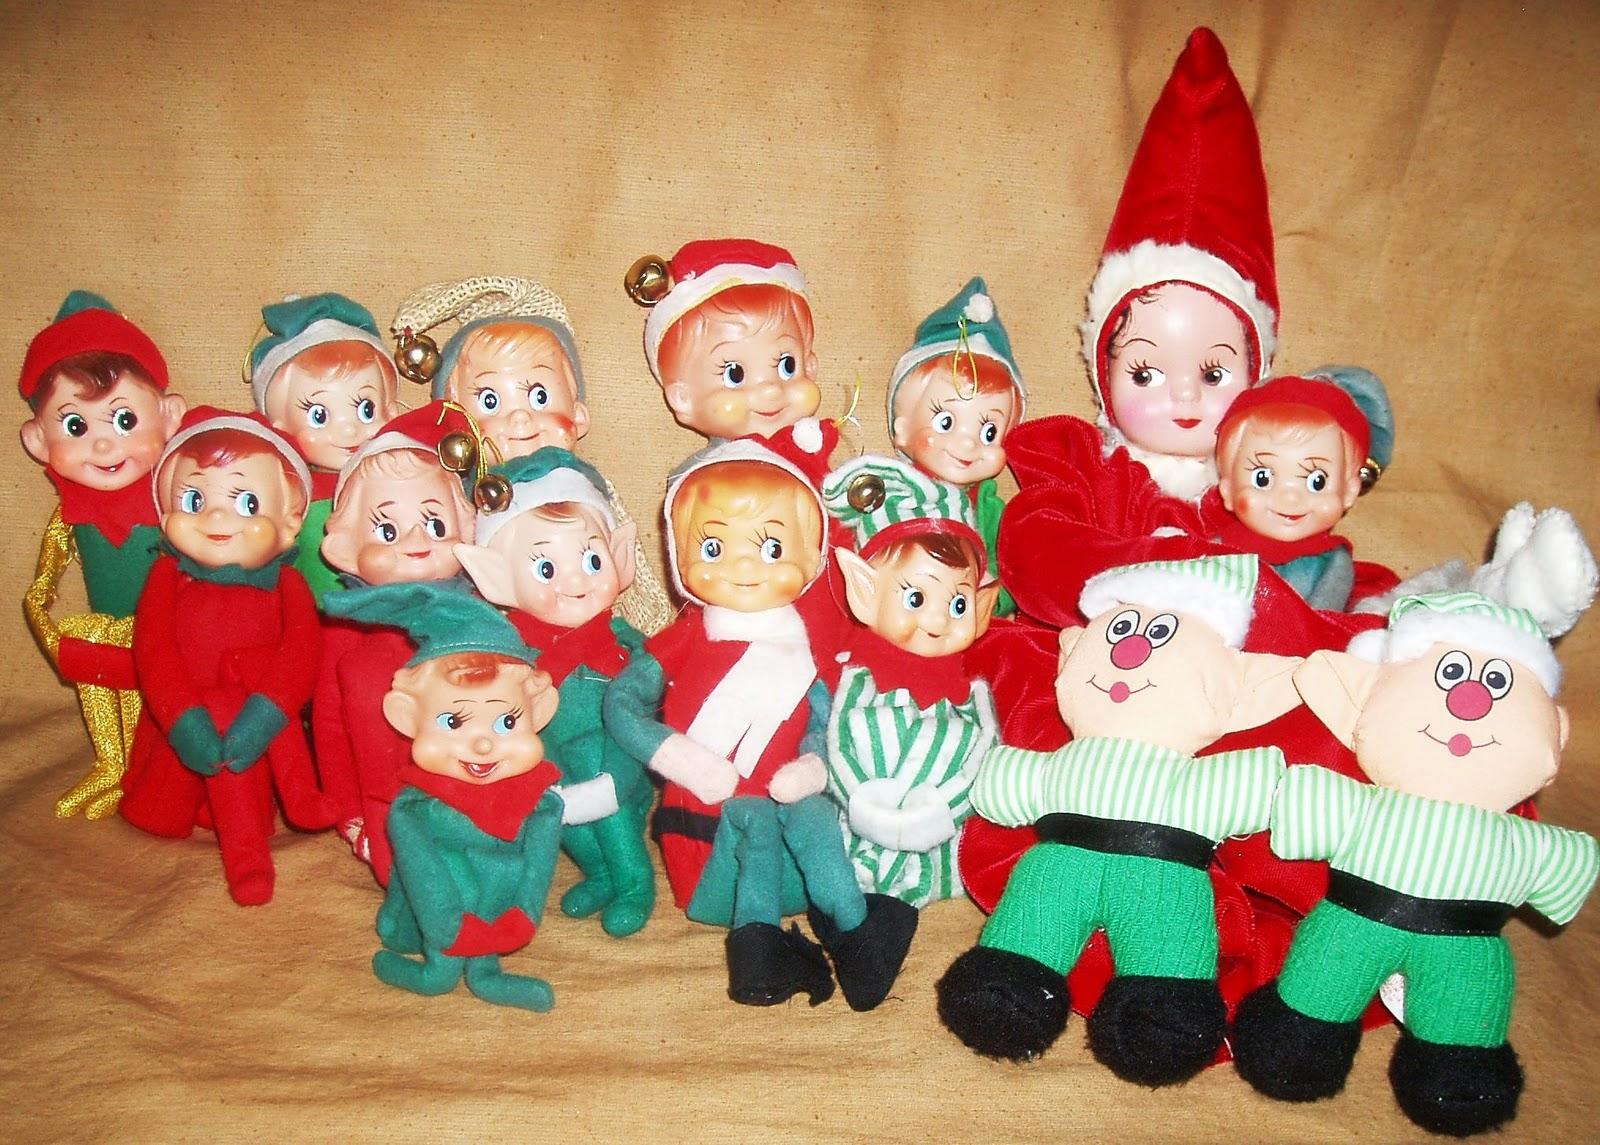 Christmas Elf wallpapers 2013 2013 Happy Xmas Elf merry Christmas 1600x1145